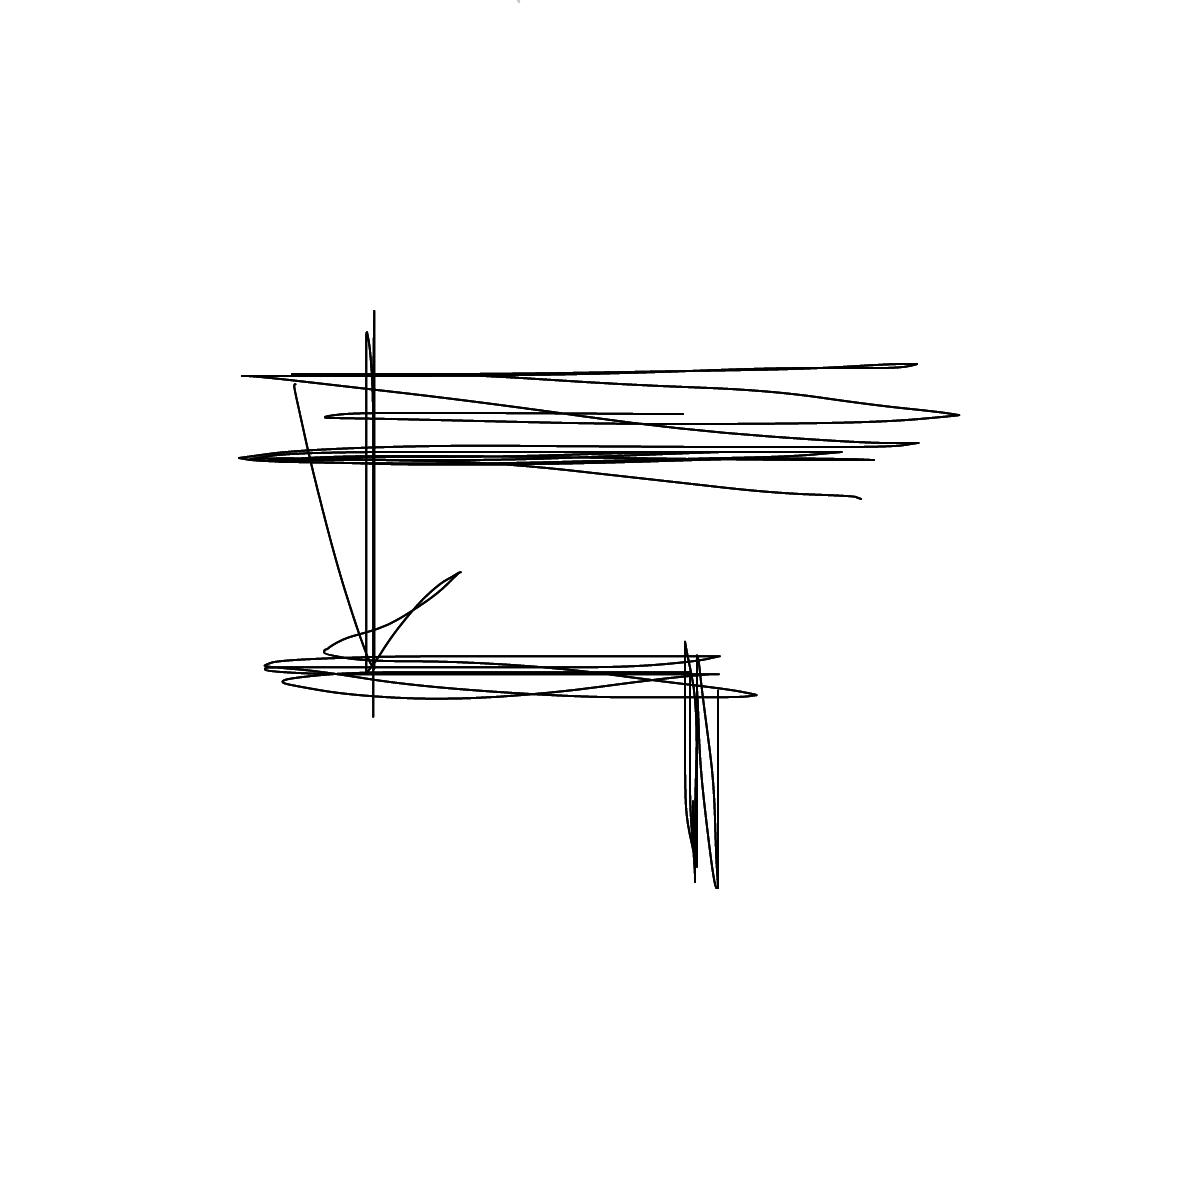 BAAAM drawing#23432 lat:77.0888671875000000lng: 156.5493774414062500